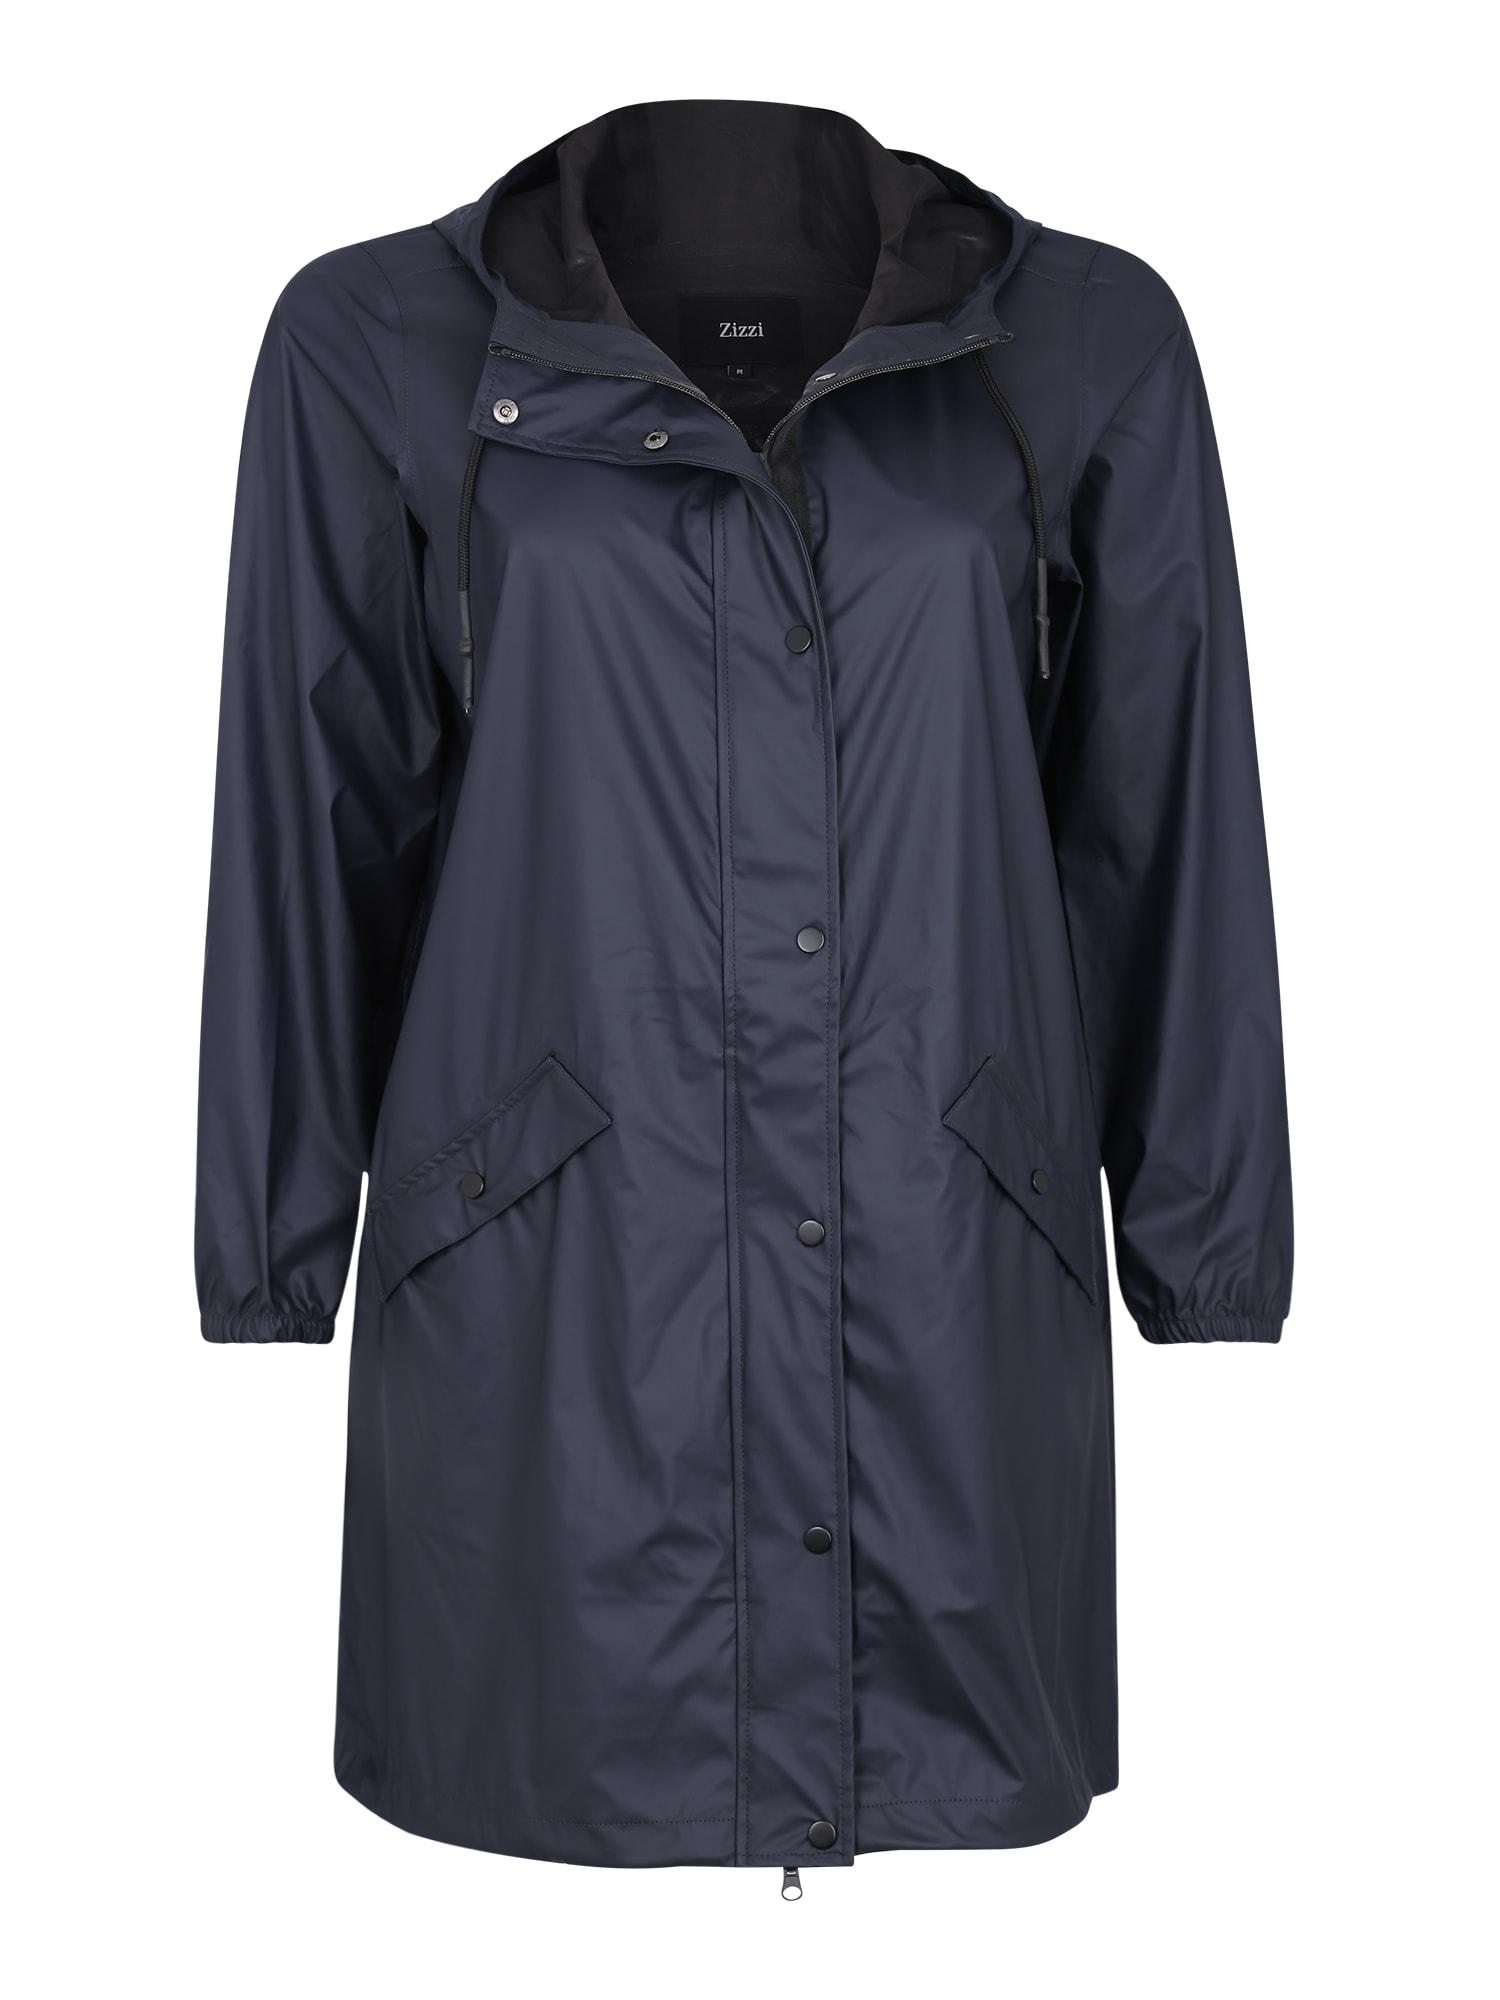 Zizzi Rudeninis-žieminis paltas nakties mėlyna